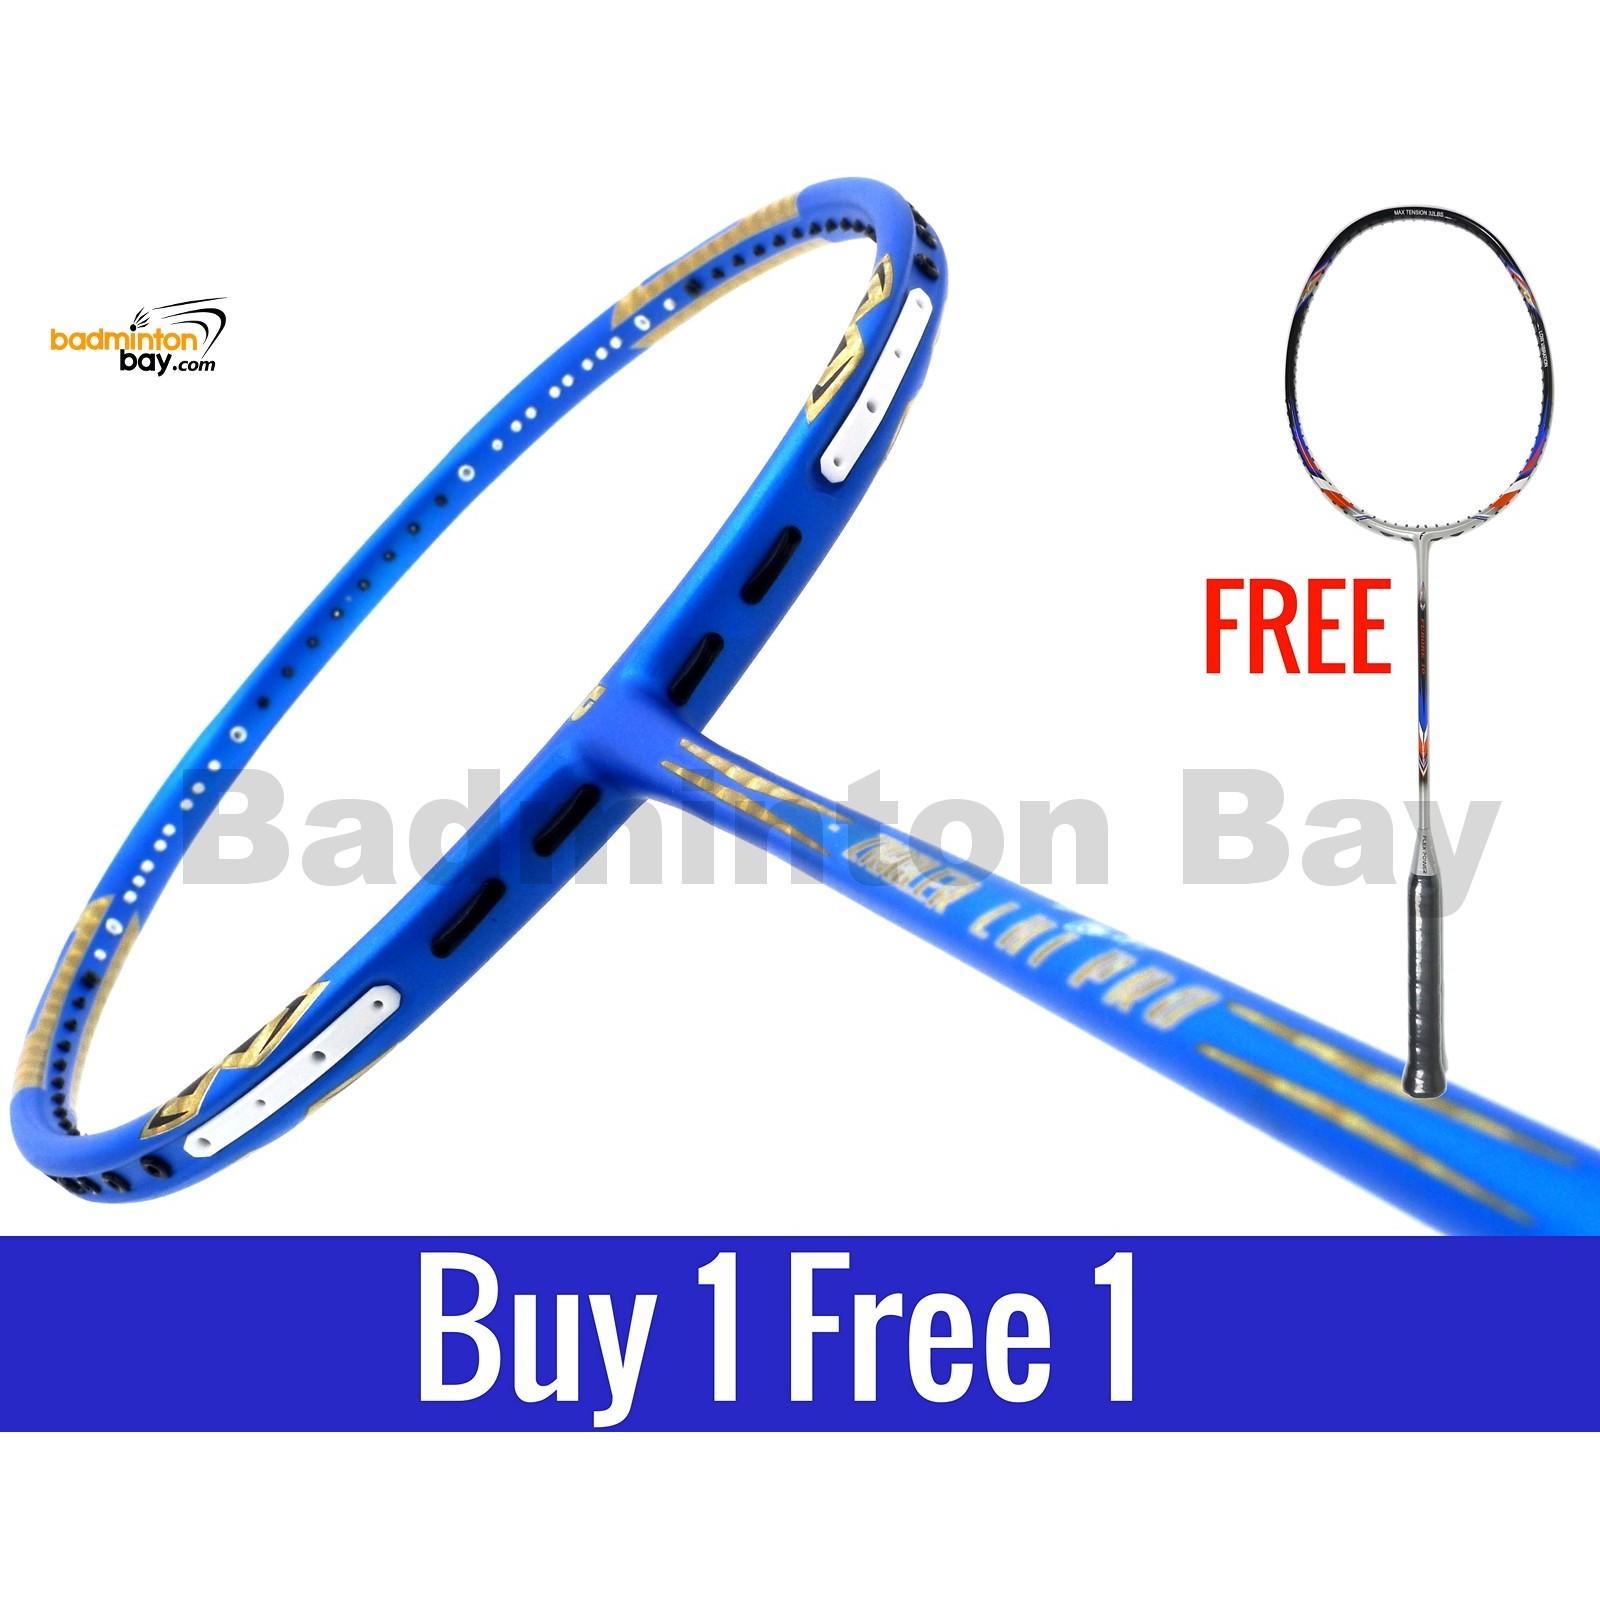 Buy 1 Free 1 Apacs Ziggler LHI PRO Blue Lee Hyun il Badminton